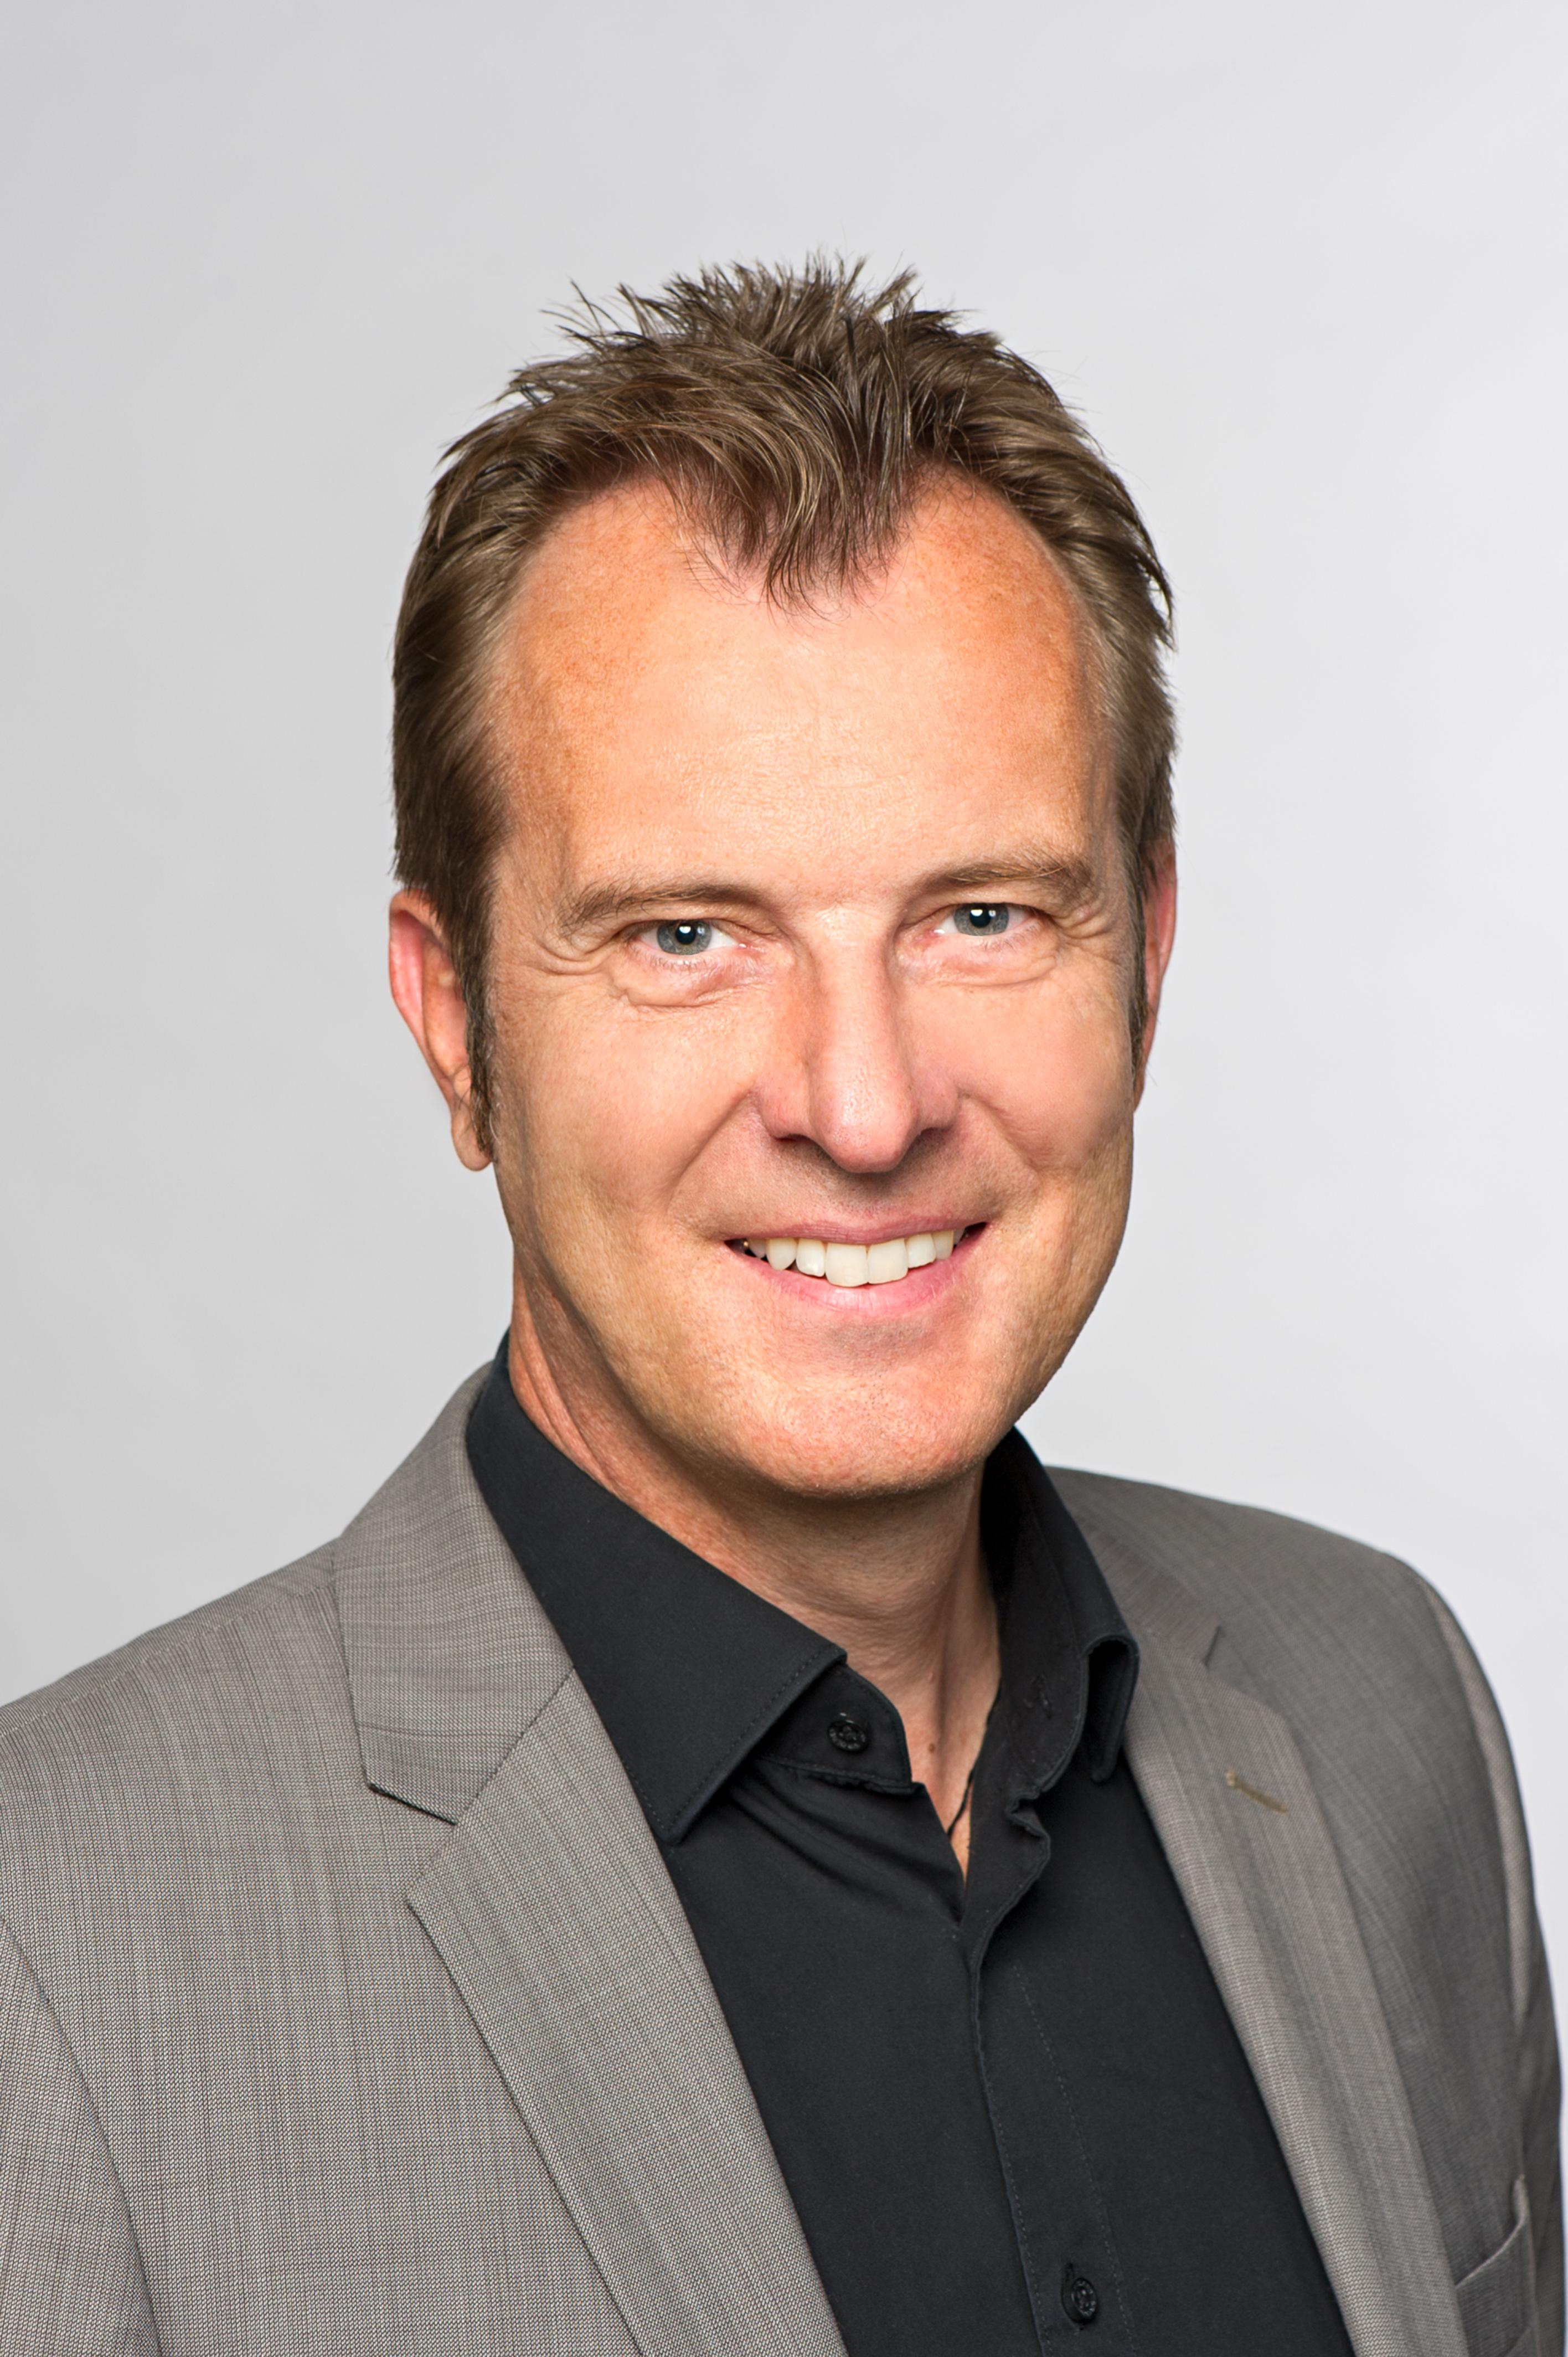 Jörg Drewes